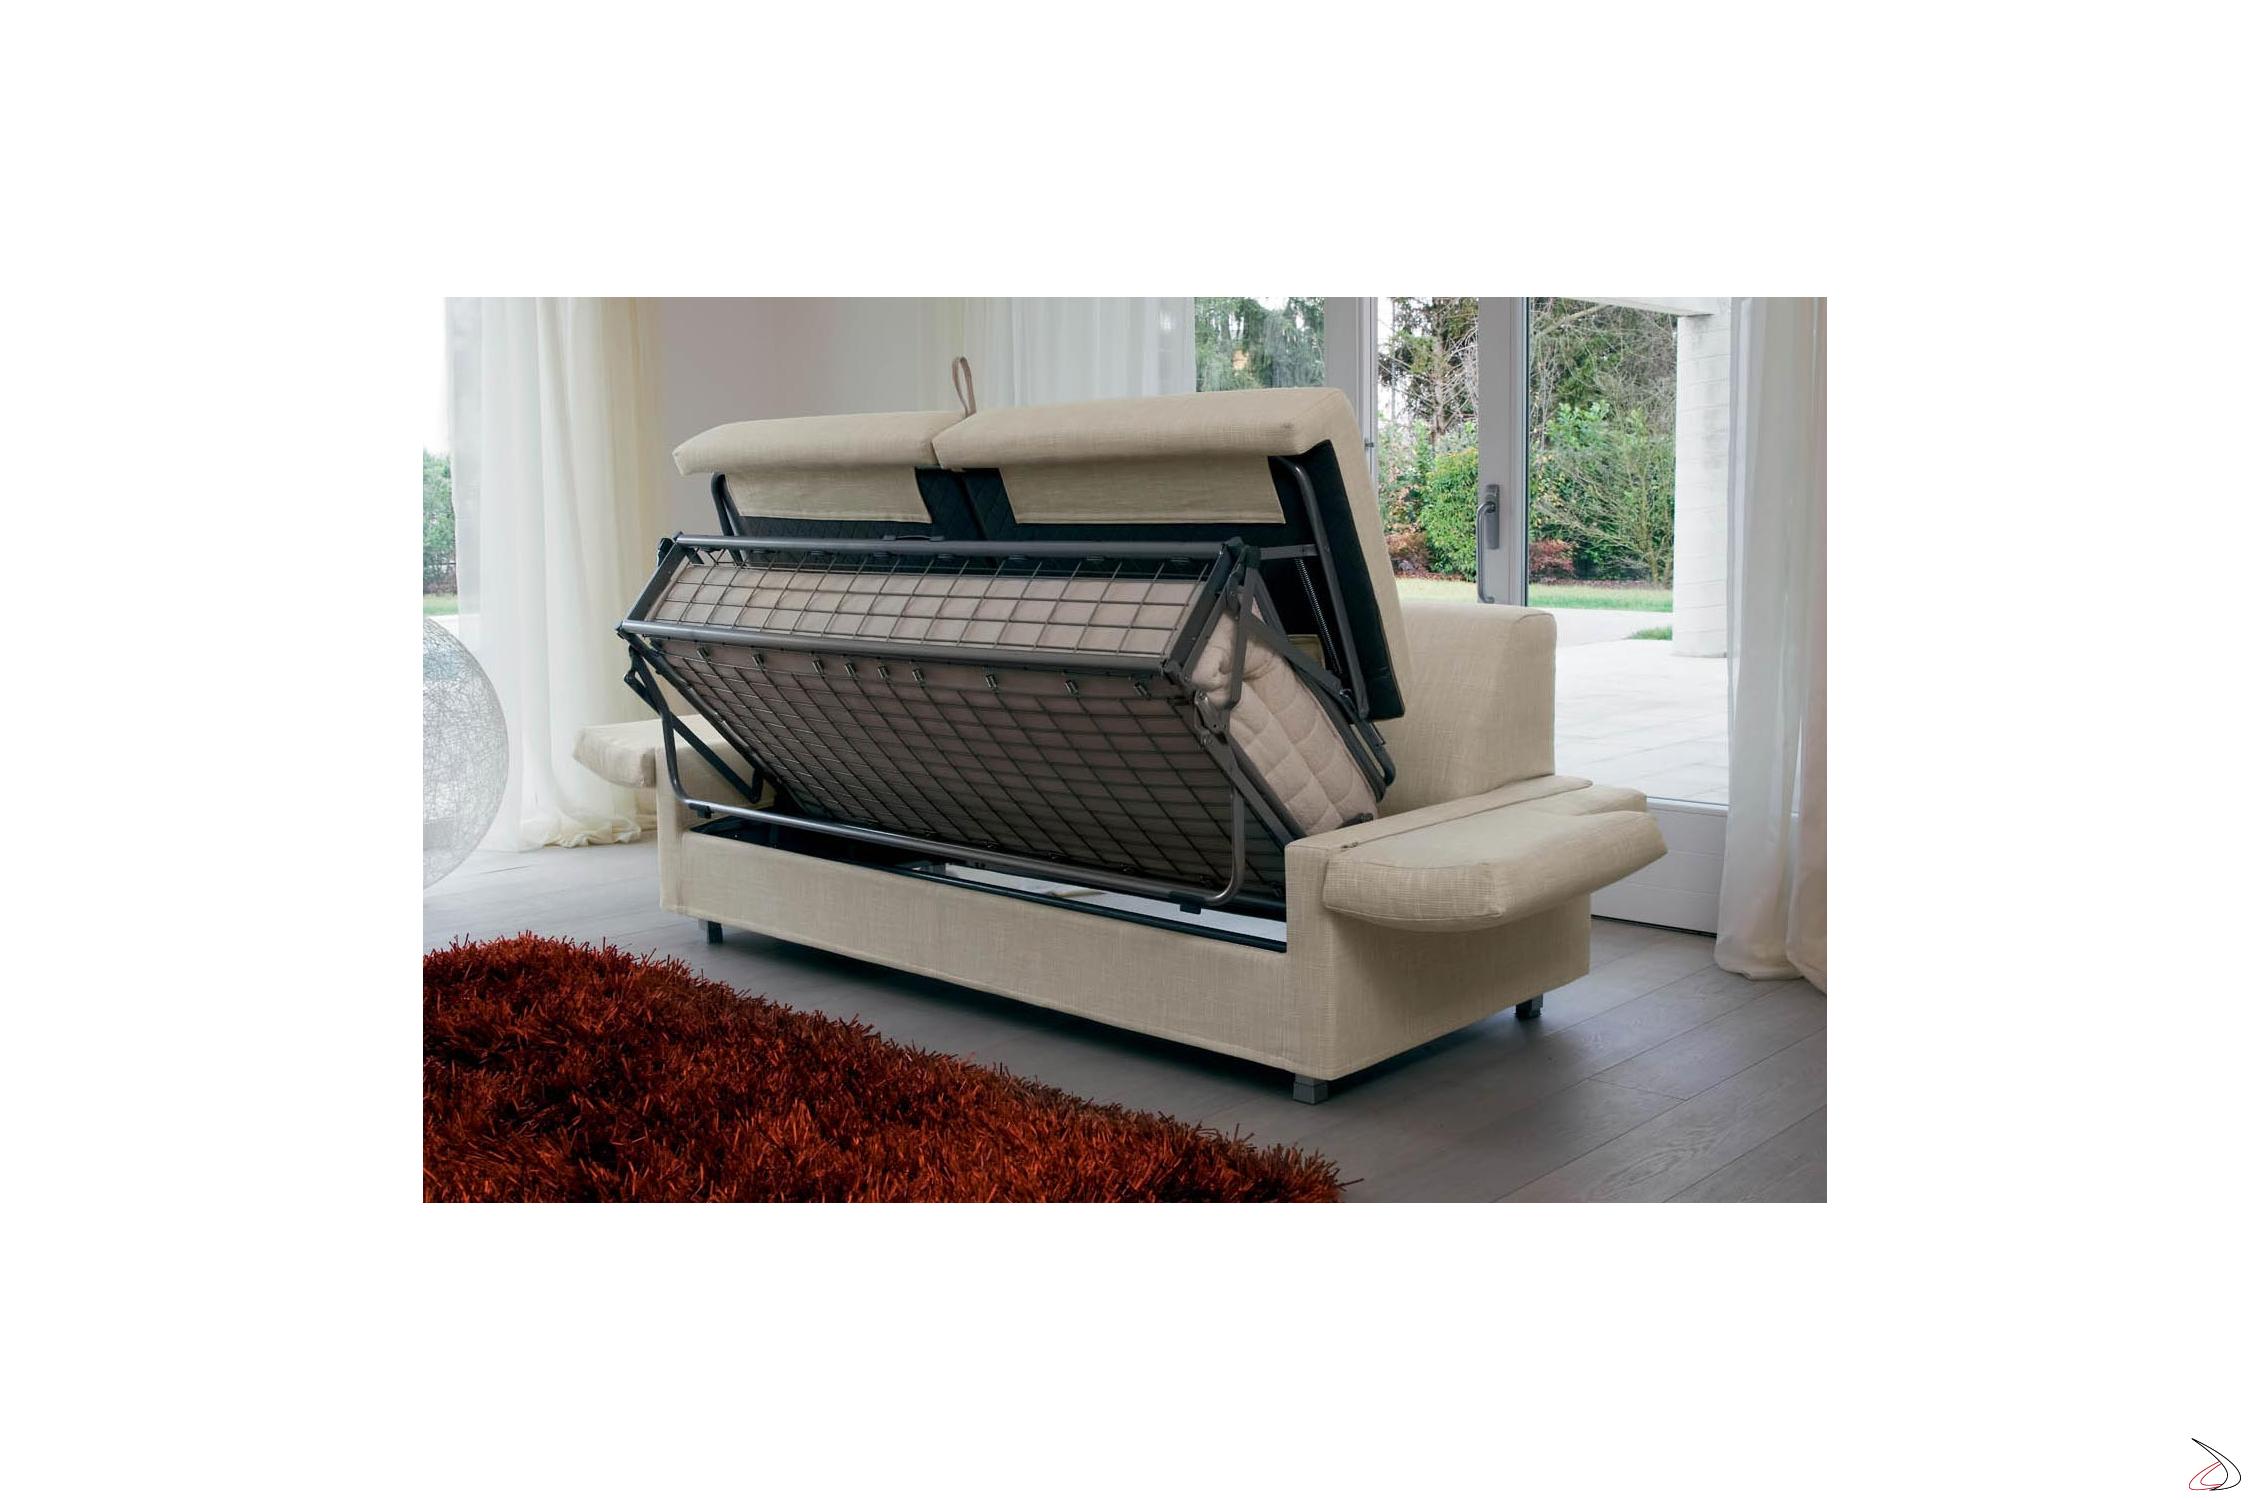 Materasso Divano Letto Matrimoniale.Cougar Sofa Bed With Low Armrests Toparredi Arredo Design Online